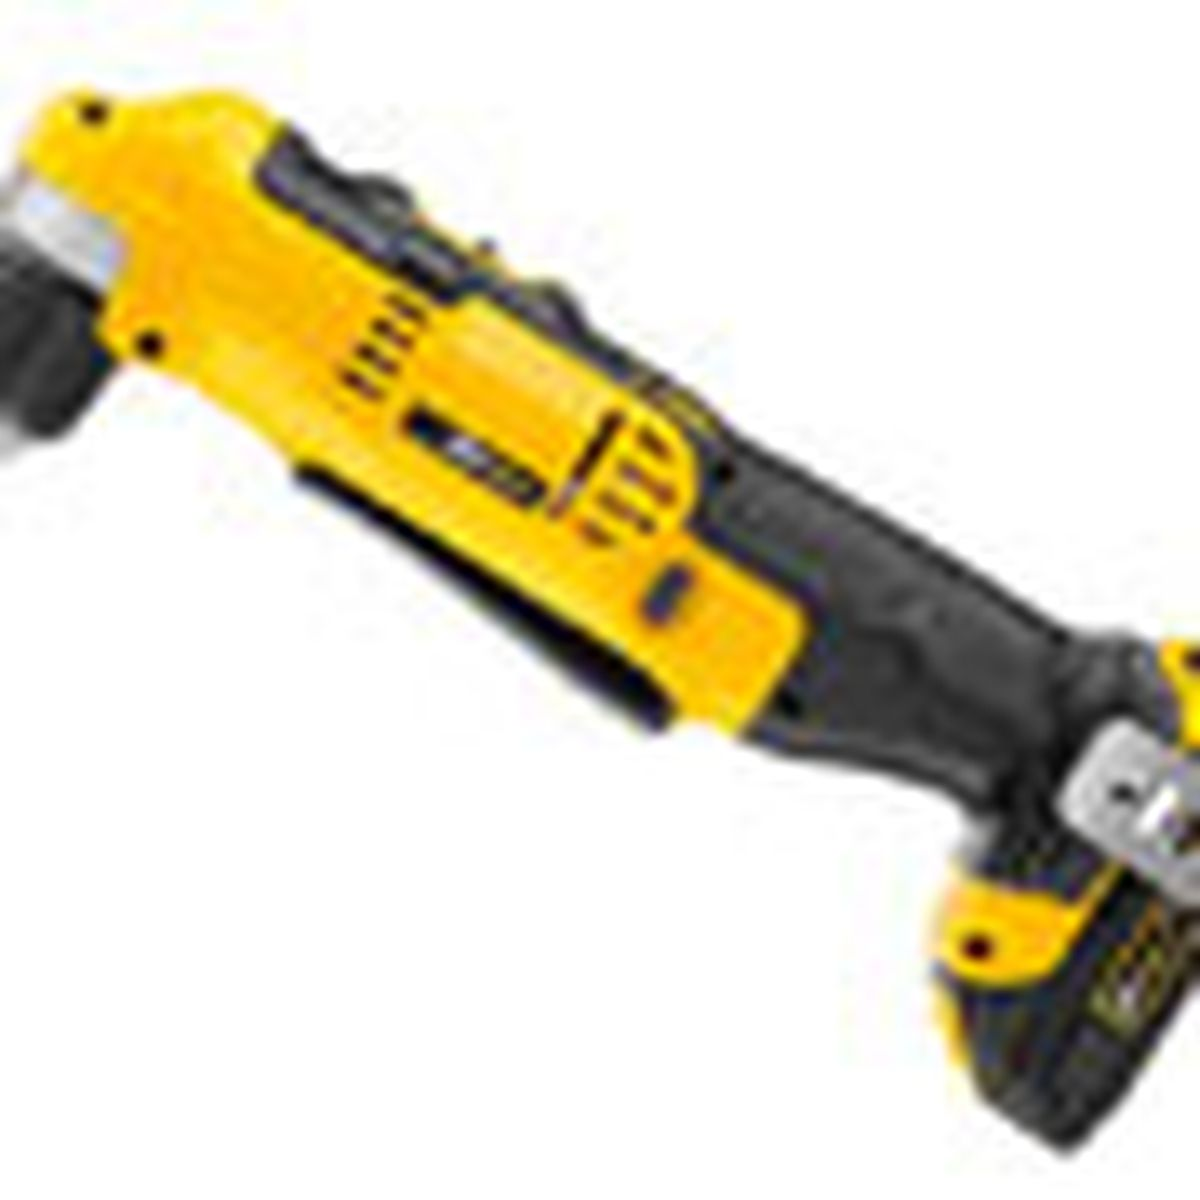 right-angle drill